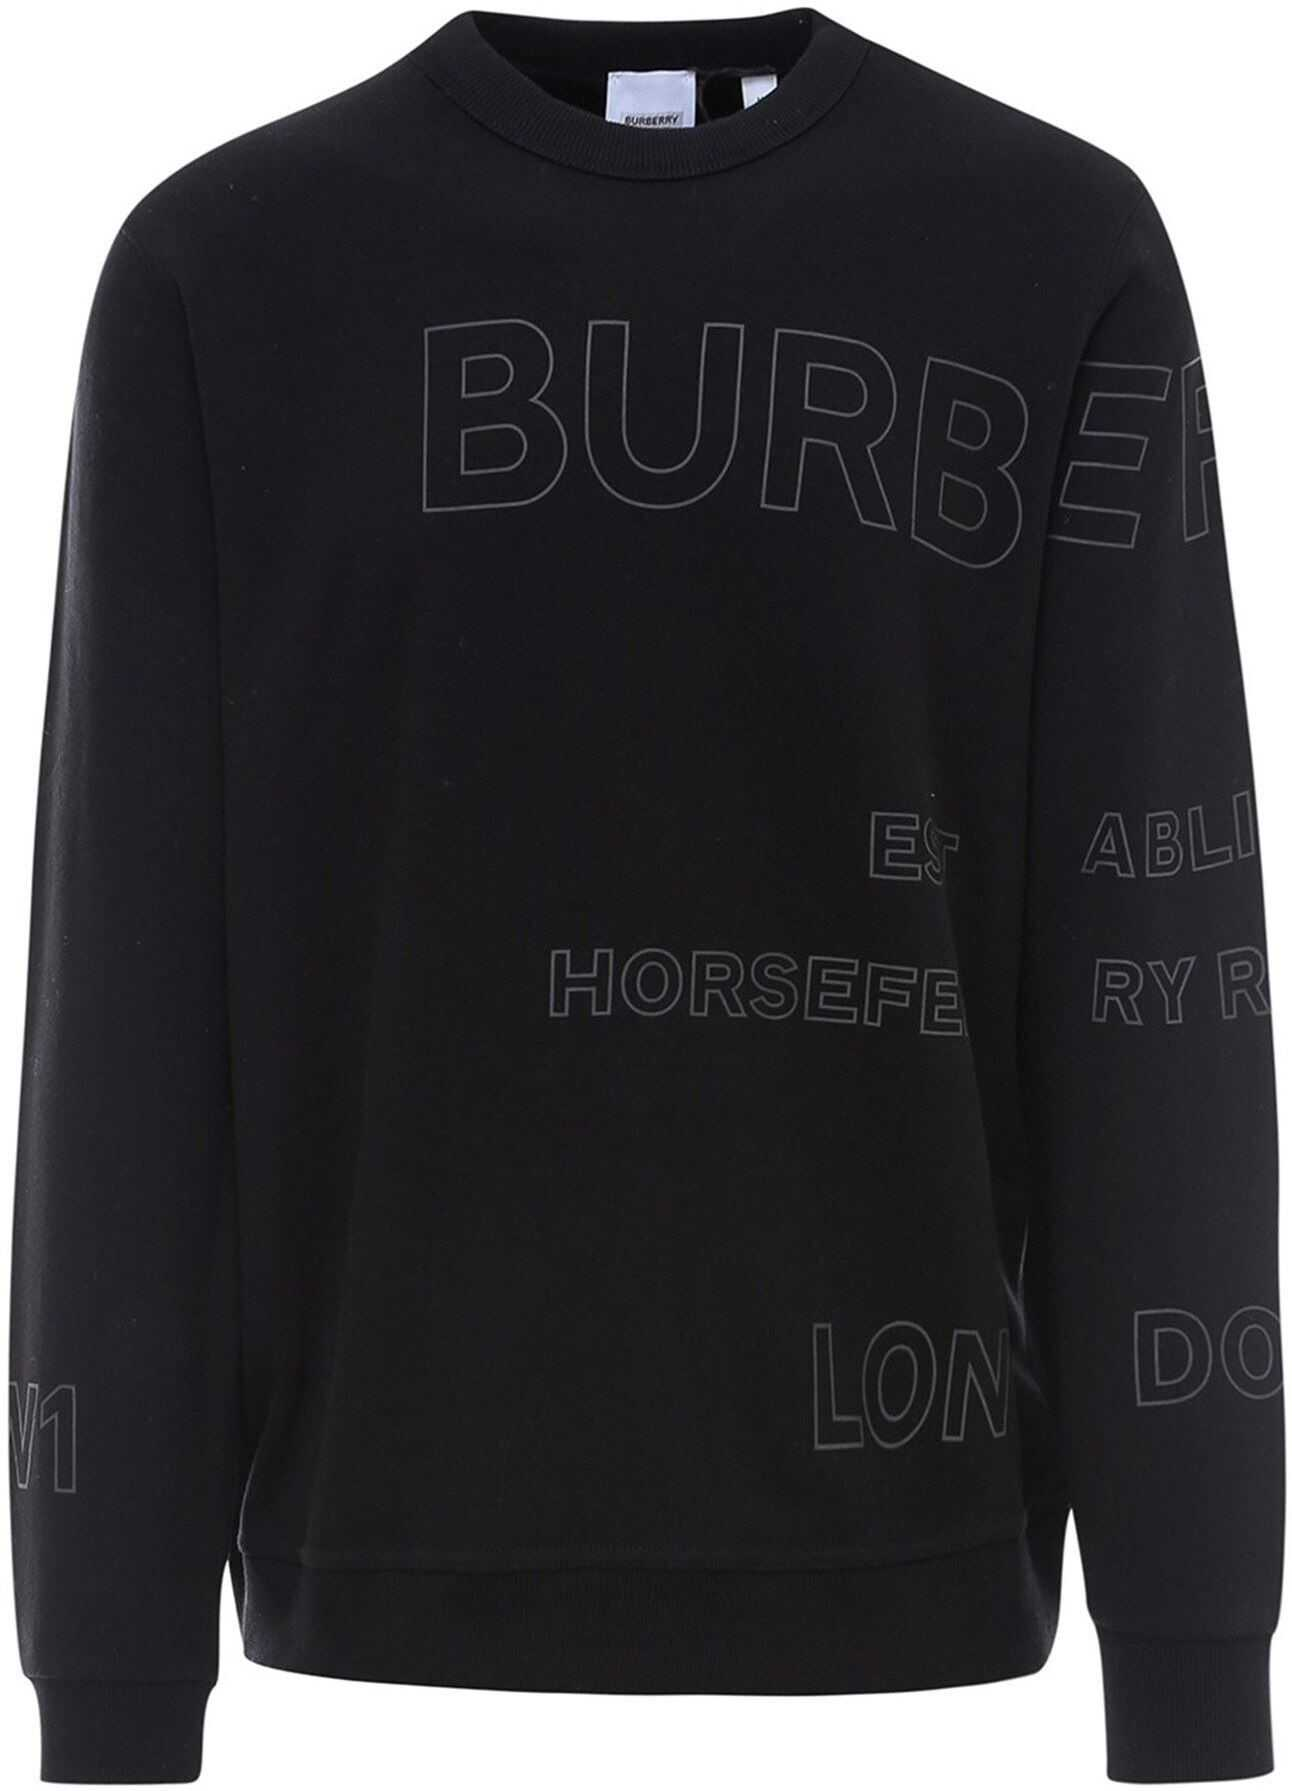 Burberry Horseferry Print Sweatshirt In Black Black imagine